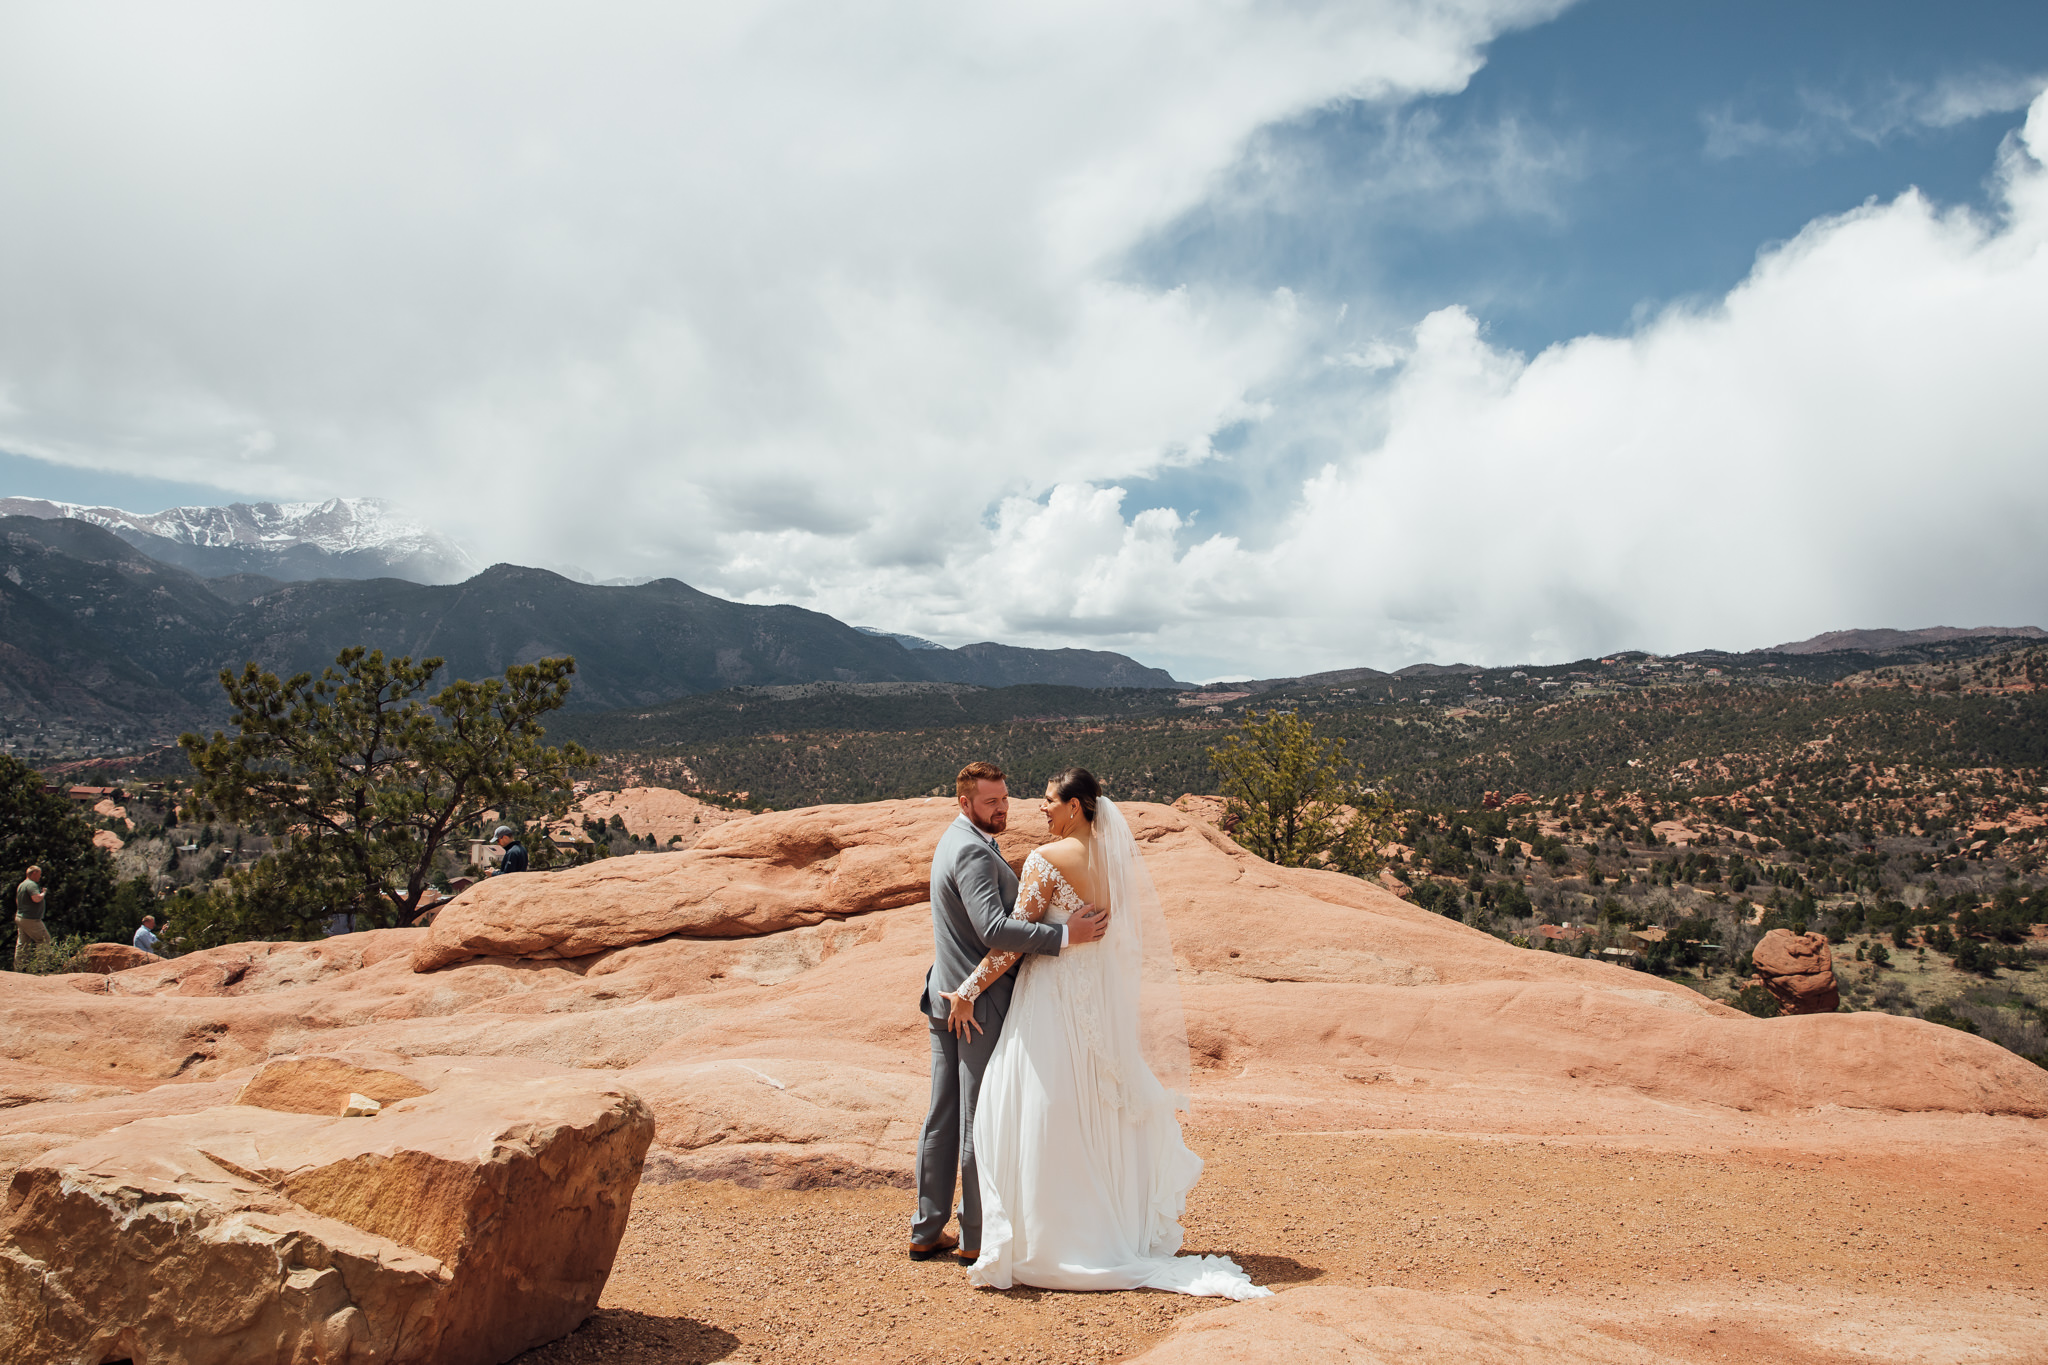 phantom-canyon-brewery-colorado-springs-wedding-photographer-49.jpg